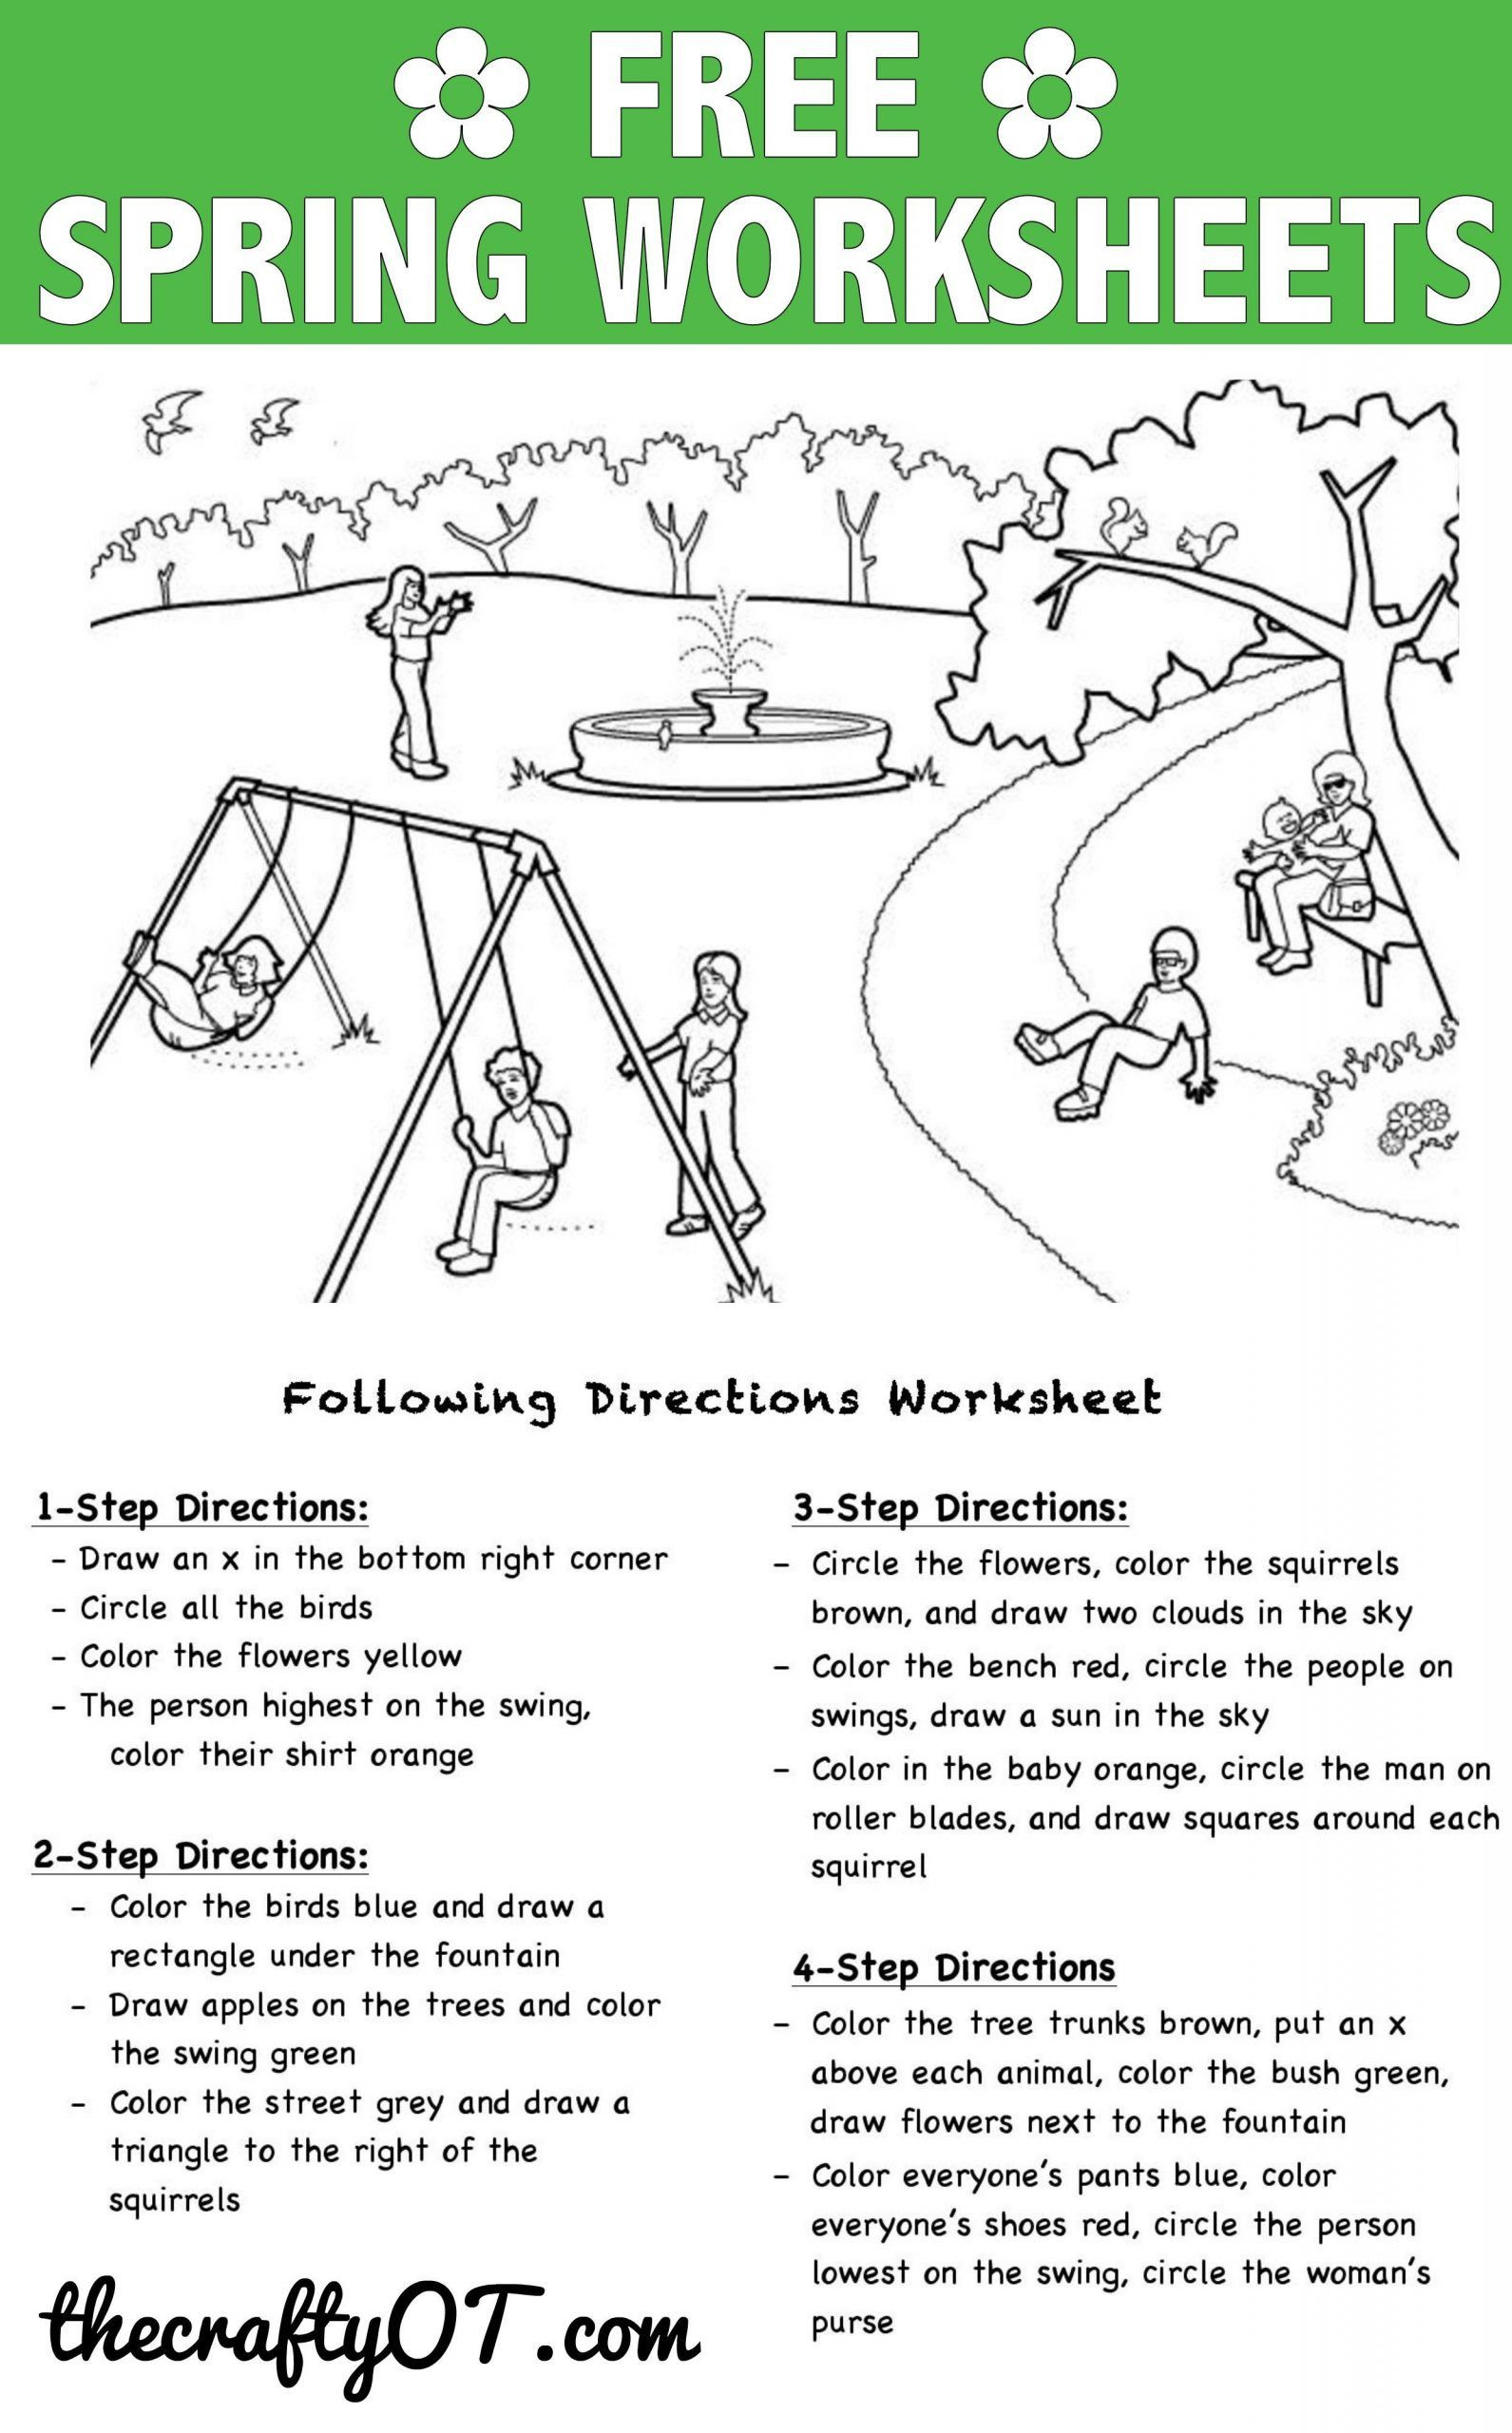 Following Directions Worksheet Kindergarten Pin On Kindergarten Worksheets Free Printable